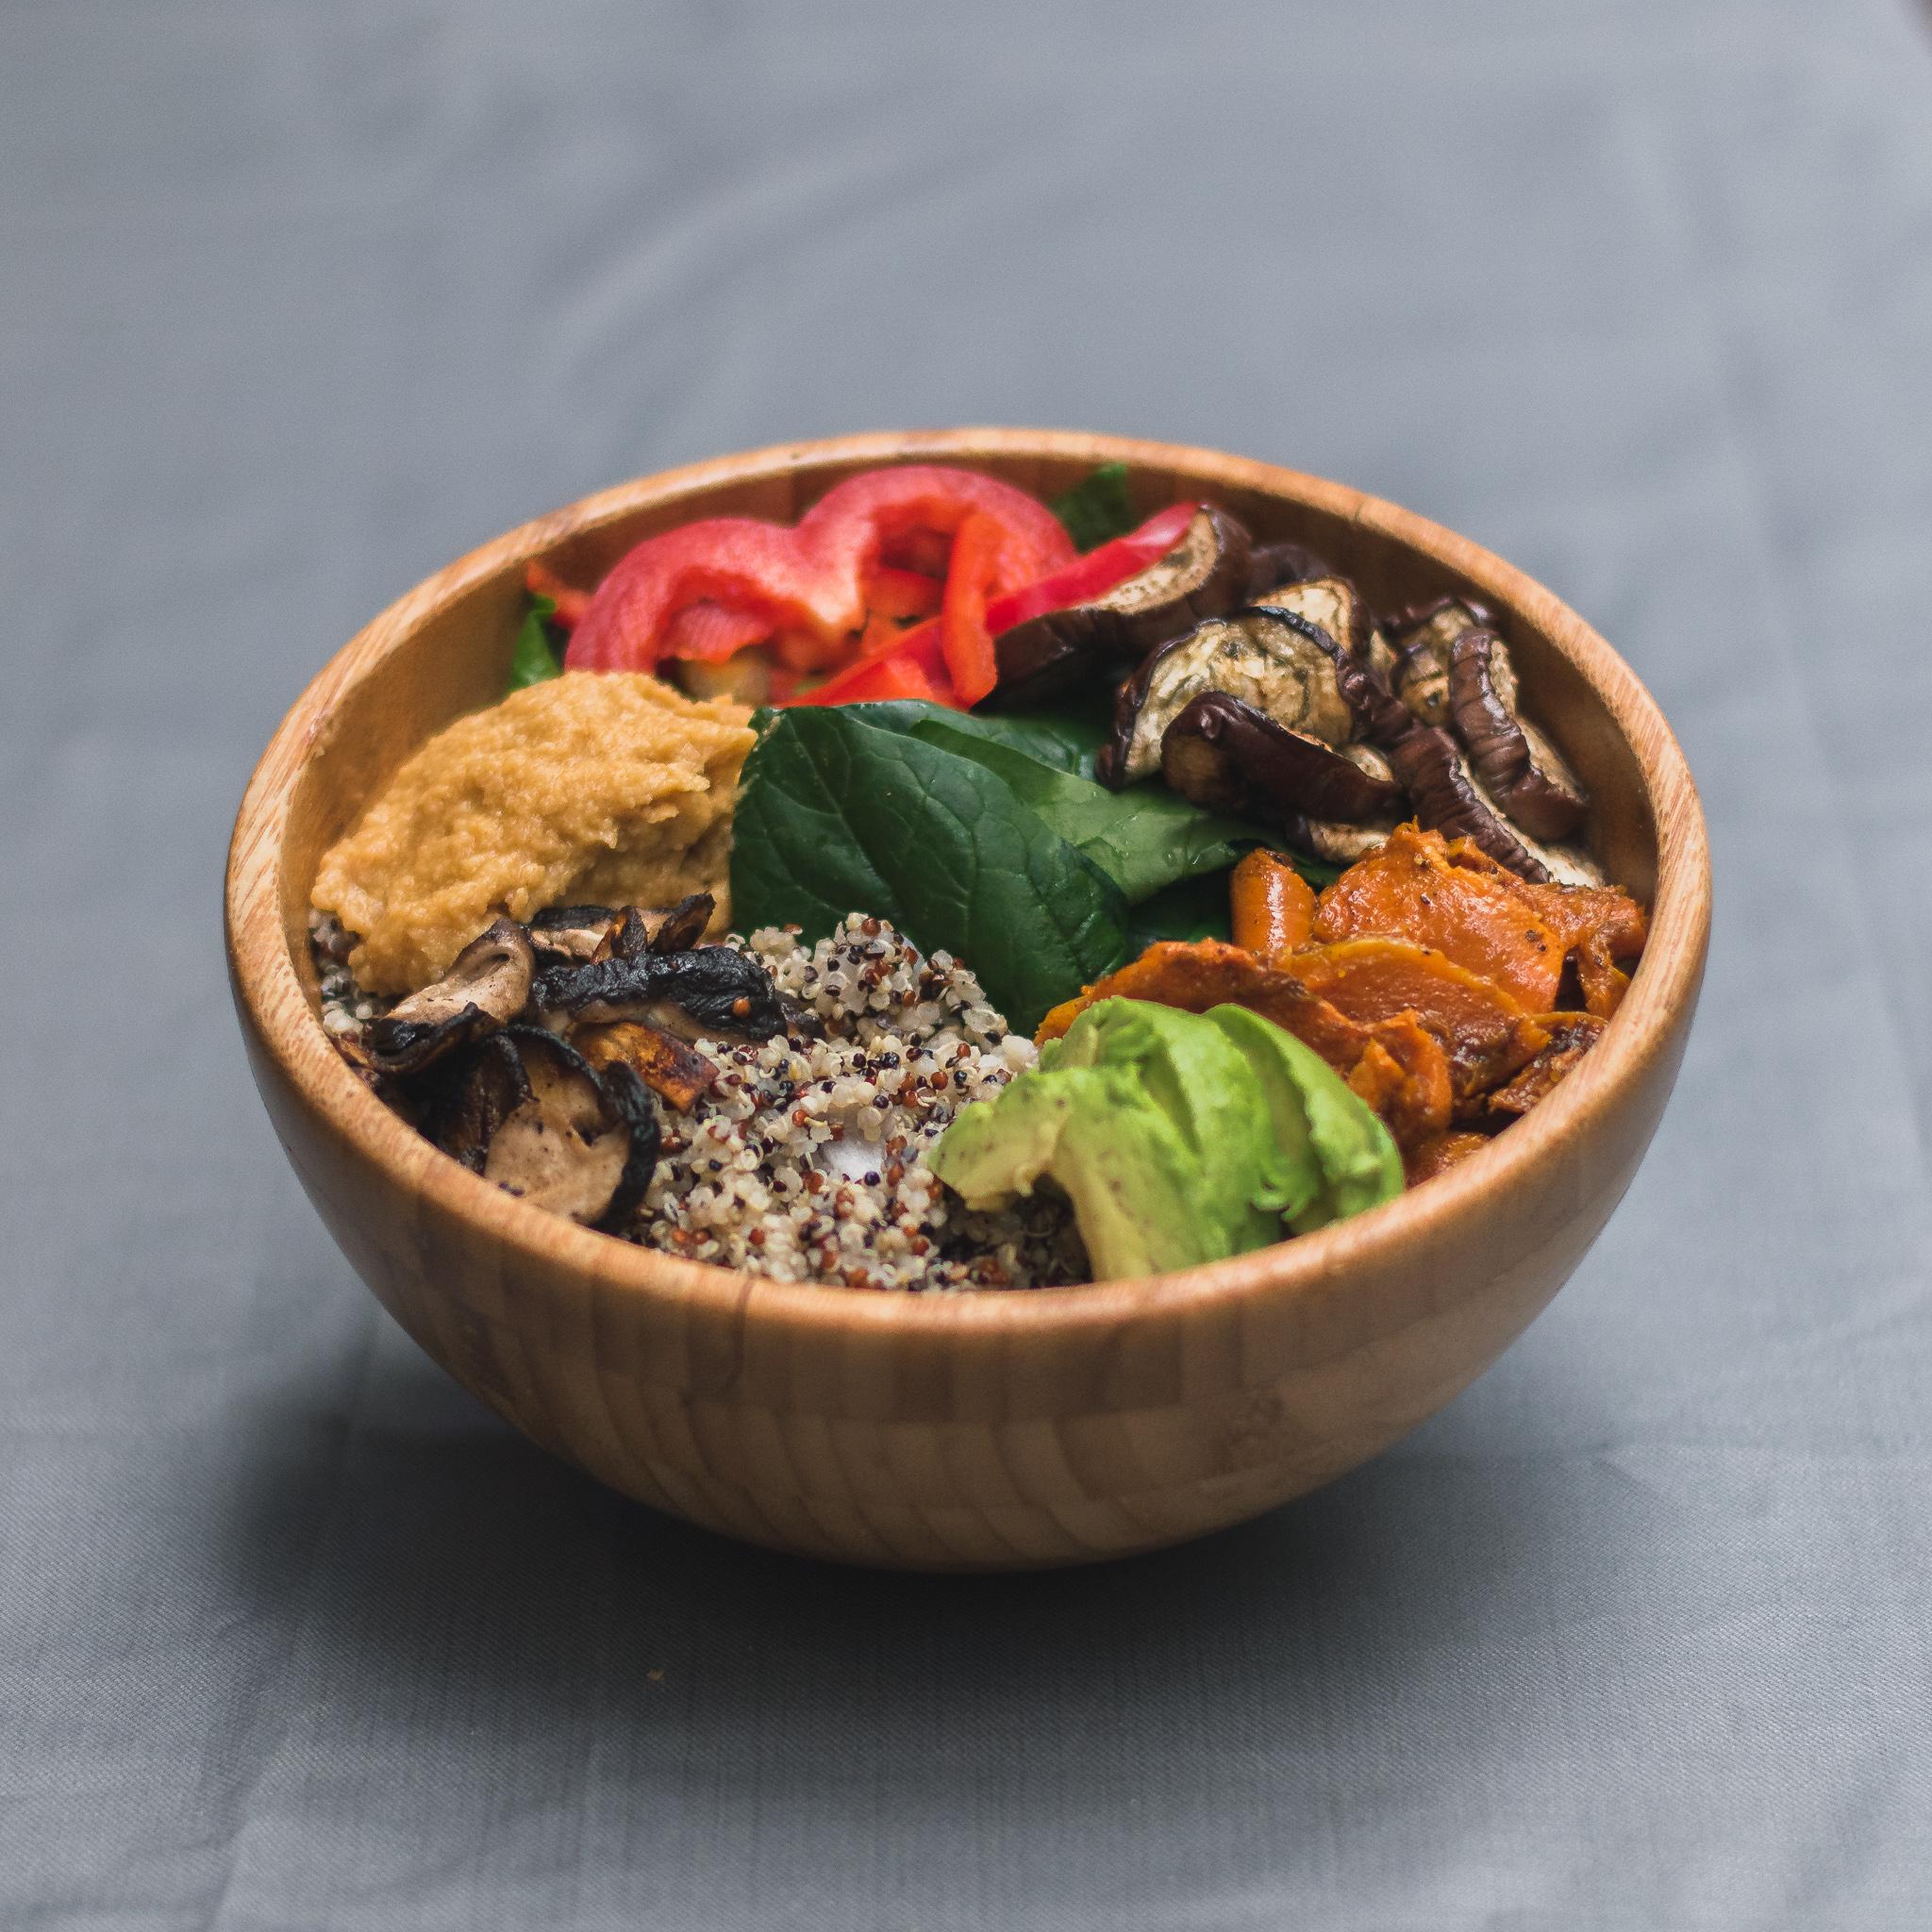 Veggie bomb, baby spinach, hummus, red pepper, eggplant, pumpkin, quinoa & avocado